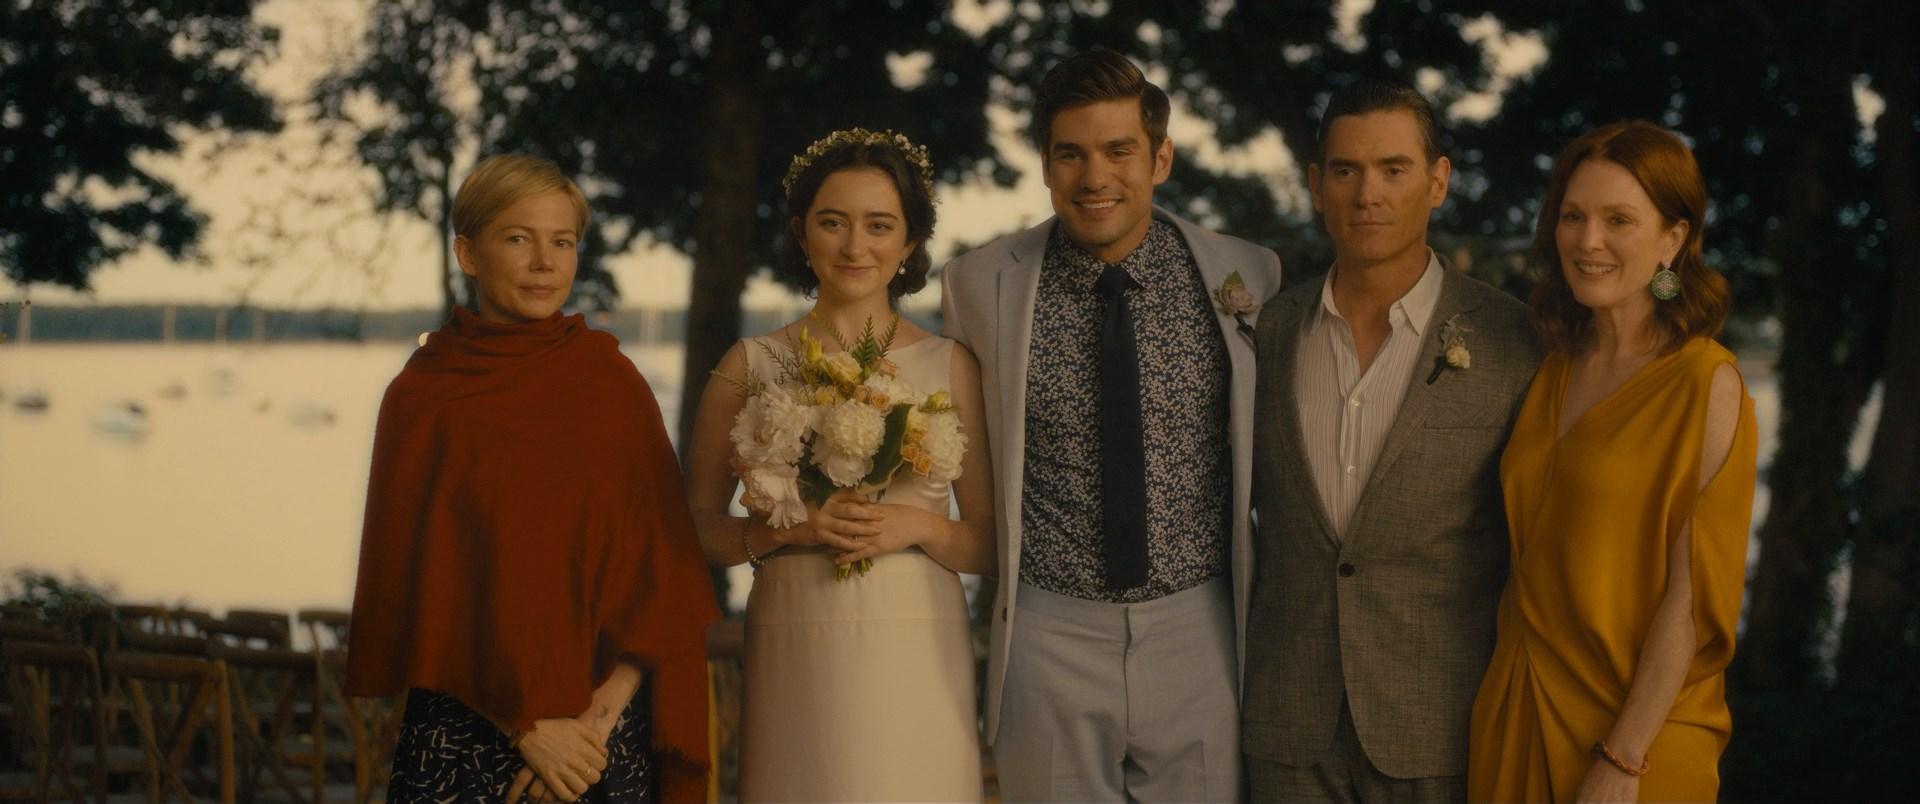 Geçmişin Sırları | After the Wedding | 2019 | BDRip | XviD | Türkçe Dublaj | 1080p - m720p - m1080p | BluRay | Dual | TR-EN | Tek Link